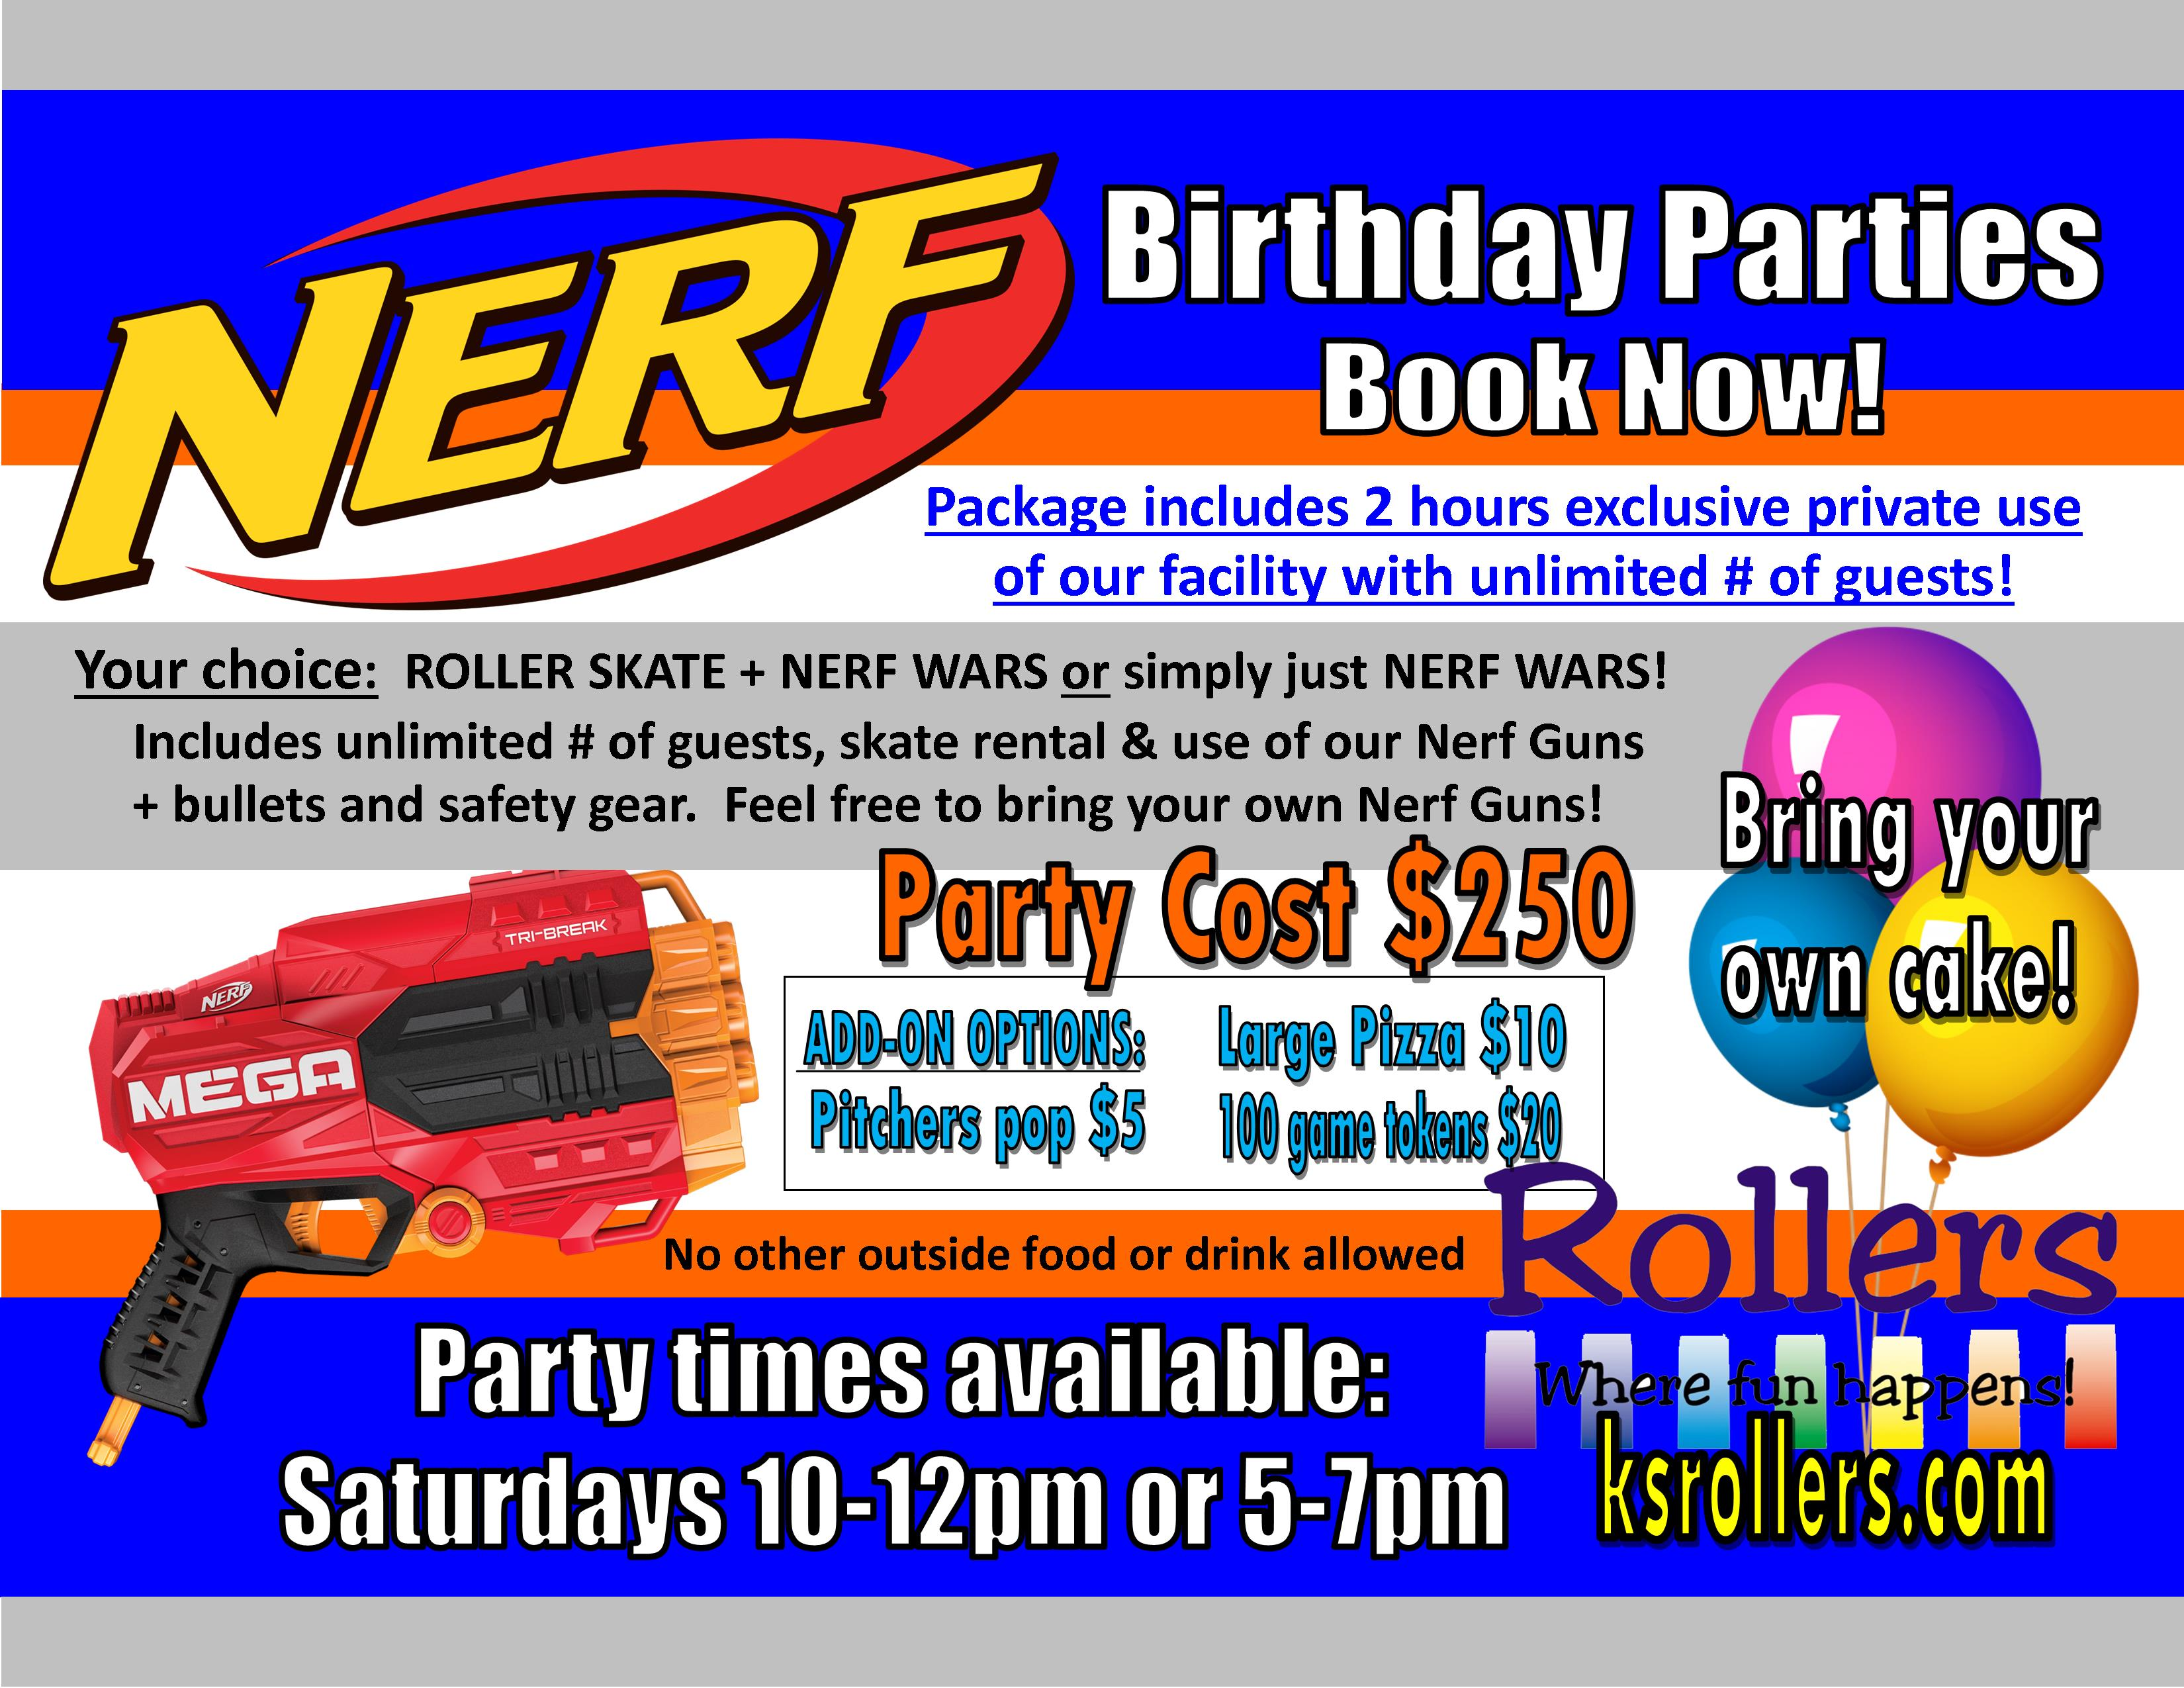 Nerf Birthday Parties